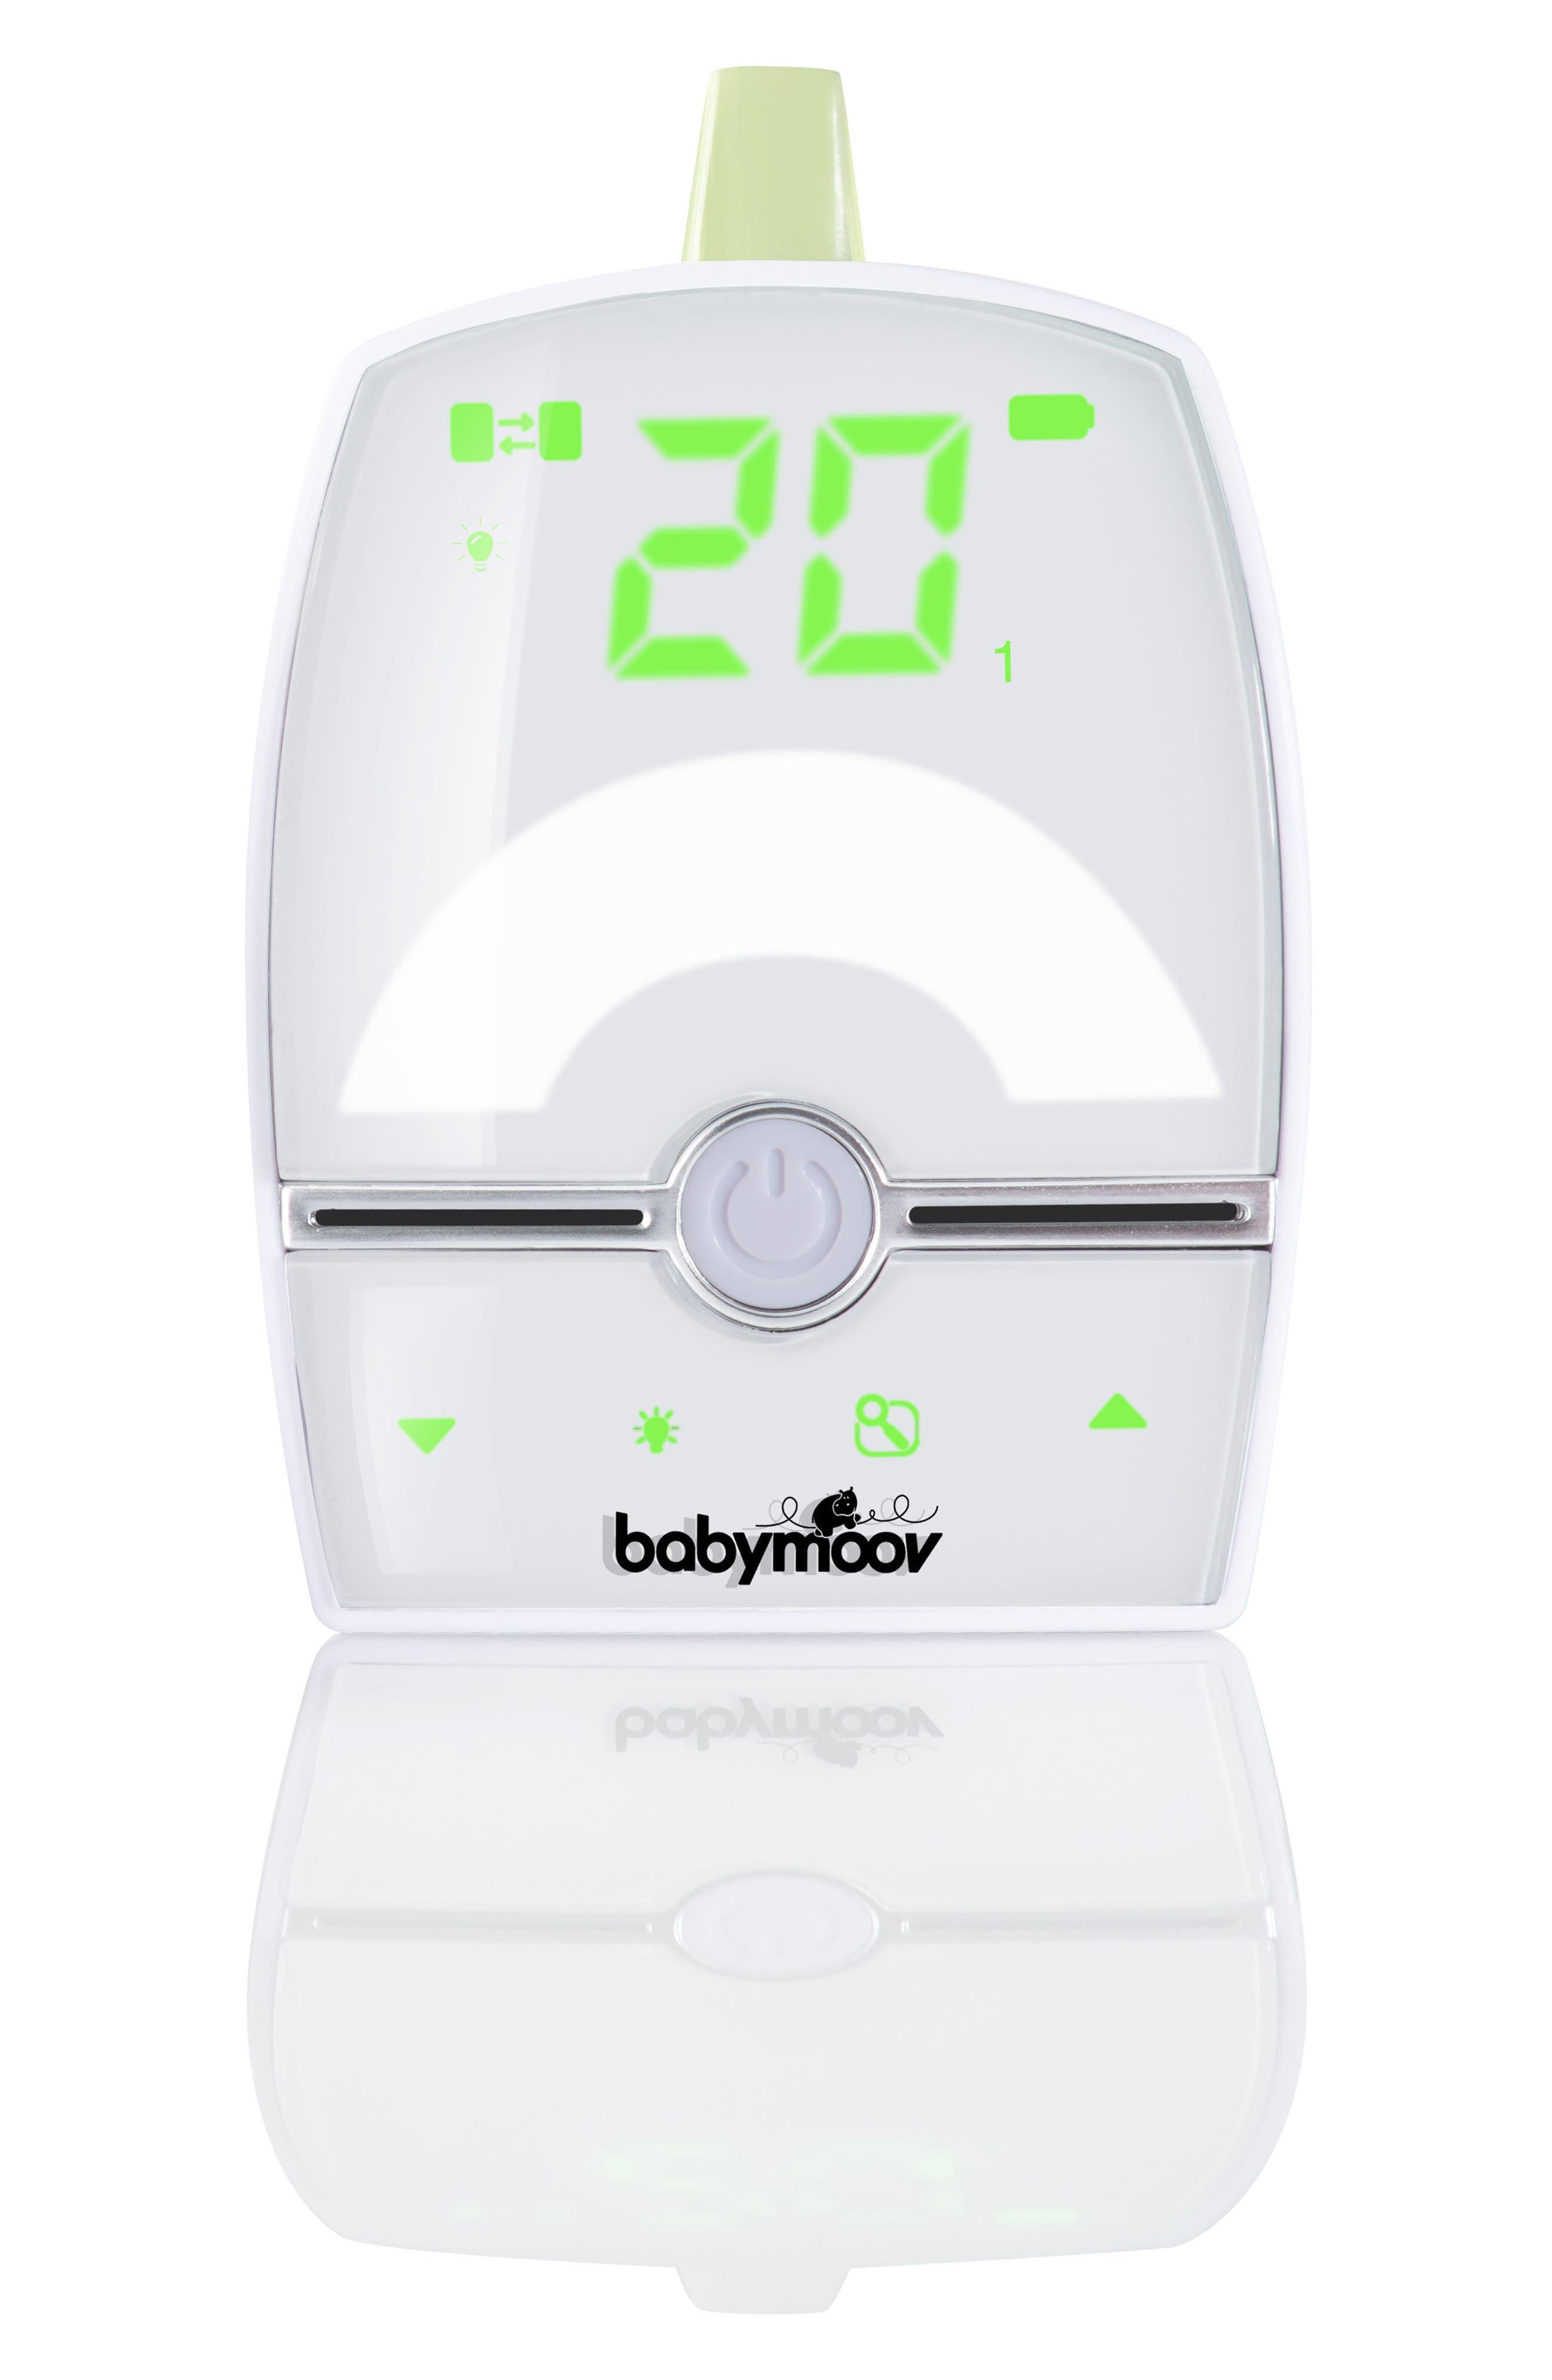 Main Image - Babymoov Extra Transmitter for Babymoov Premium Care Baby Moniter